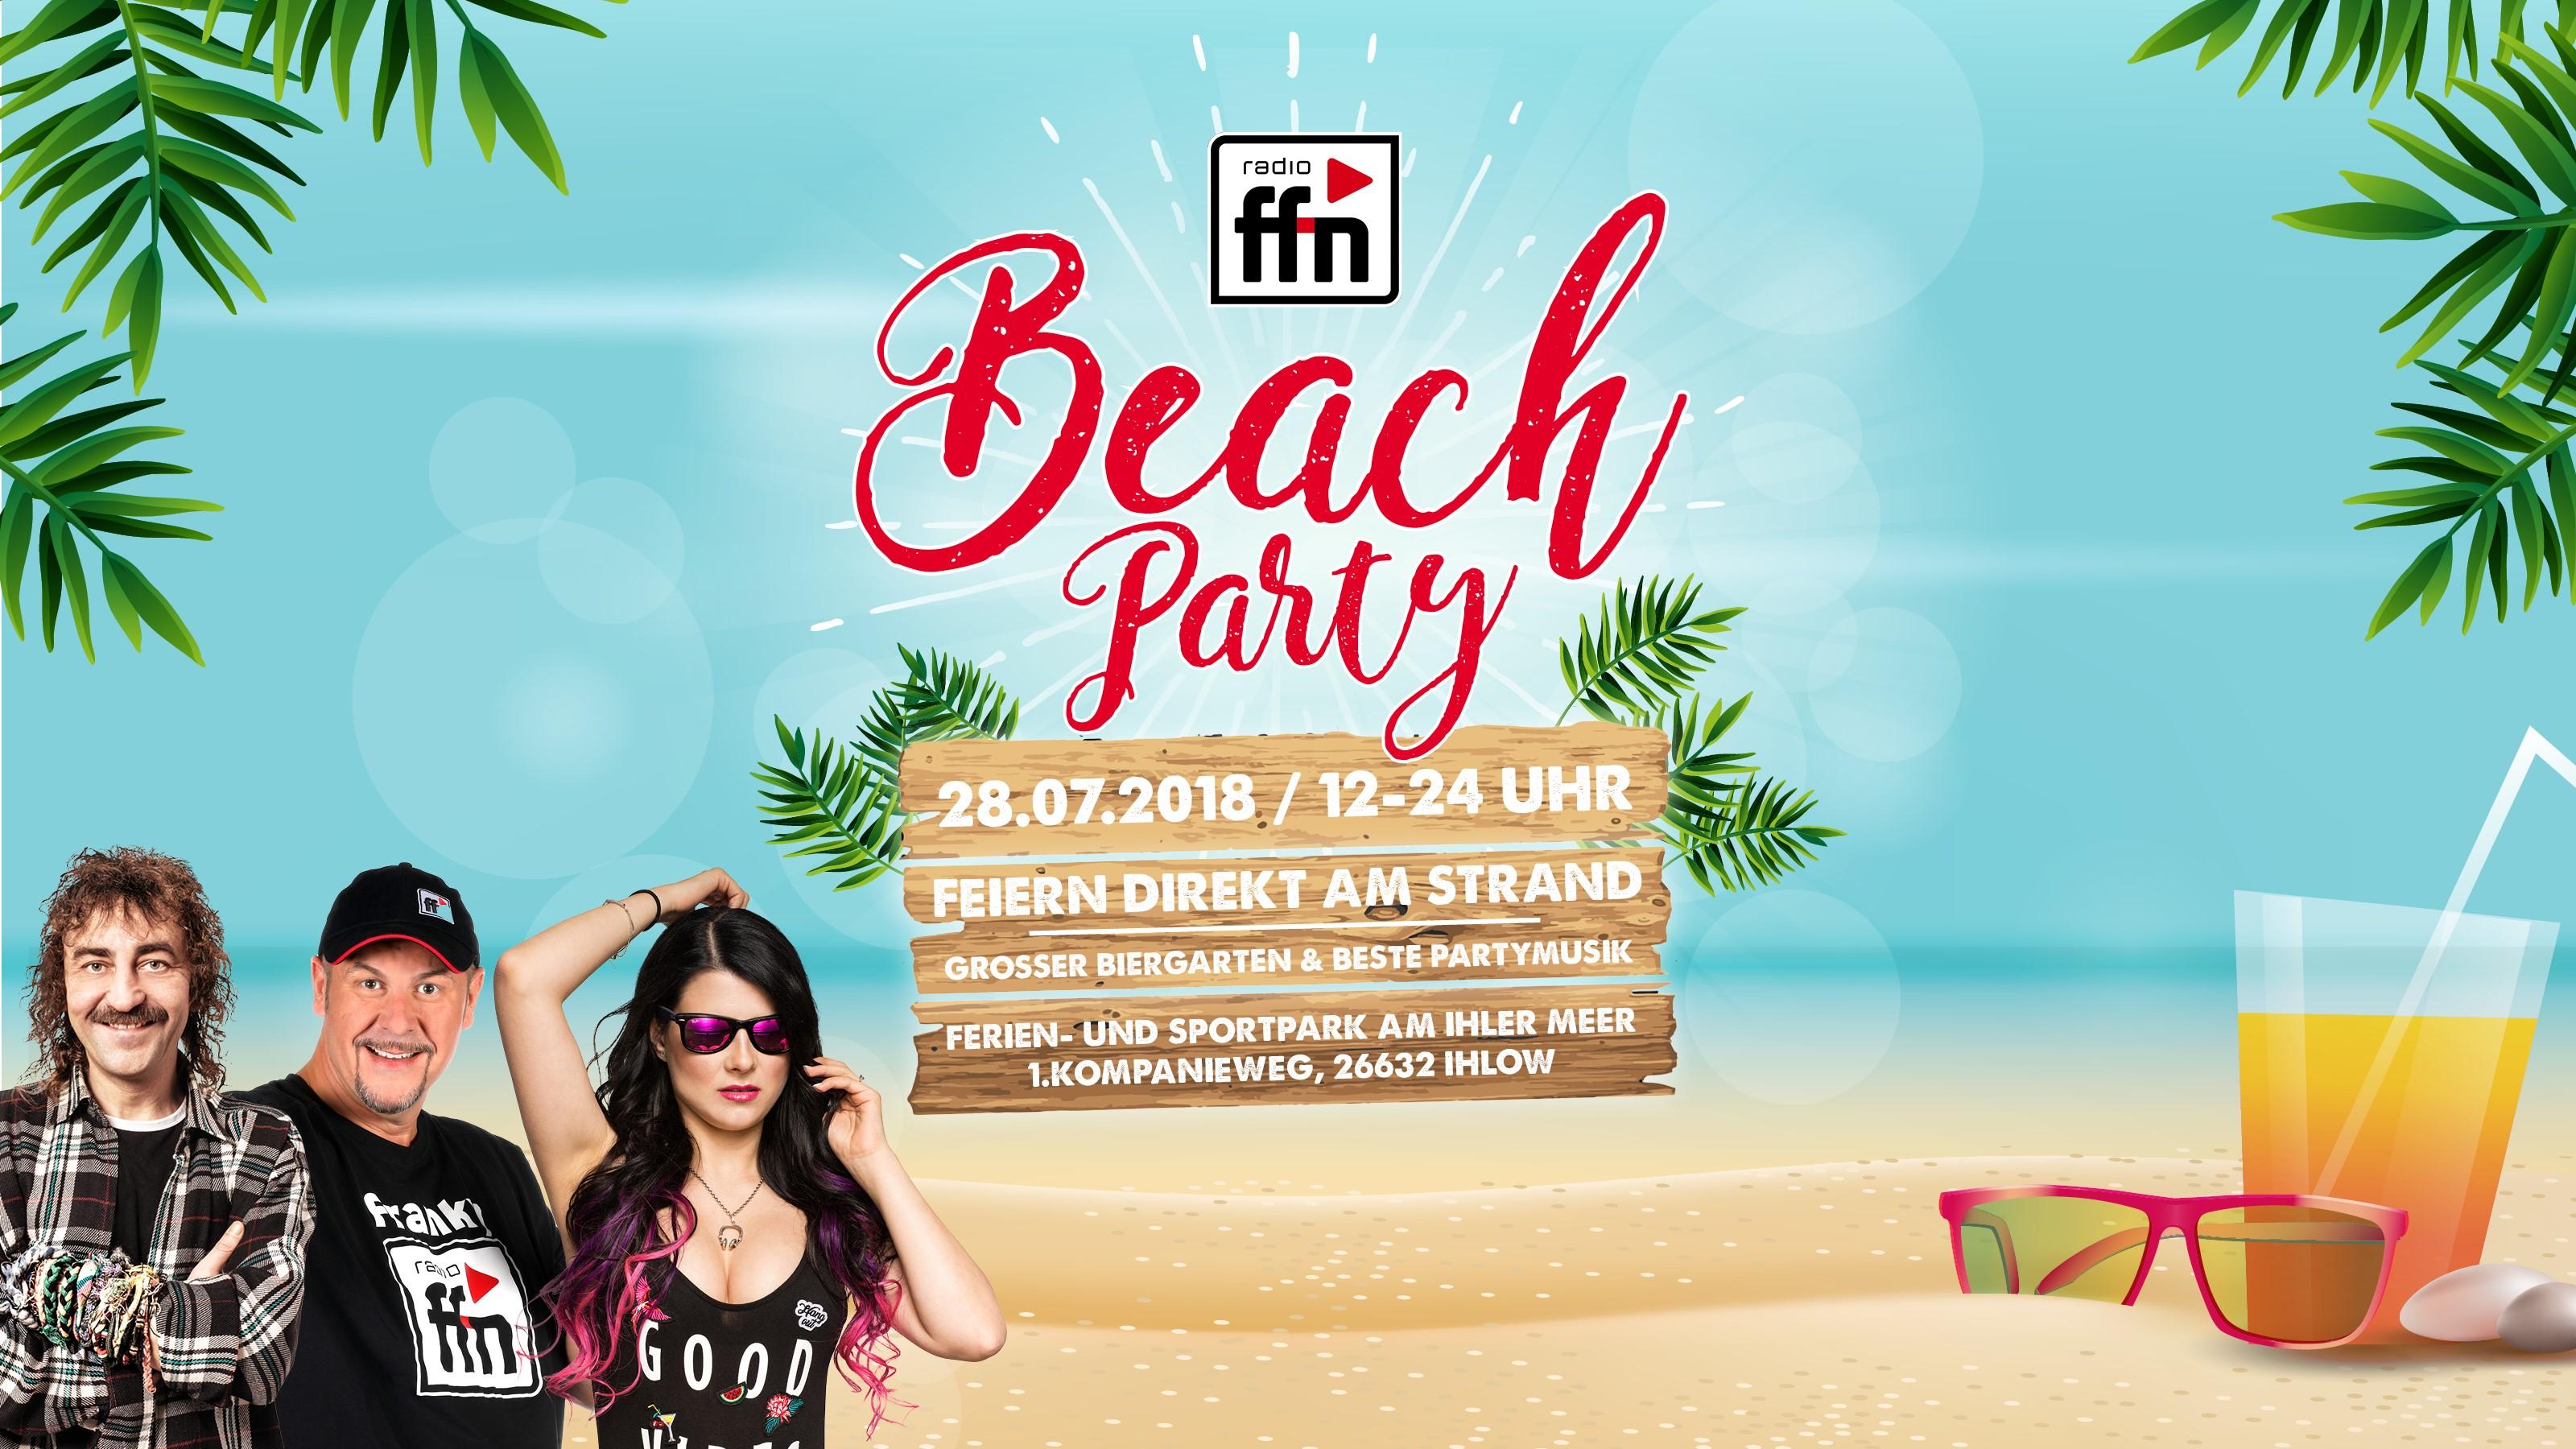 ffn Beachparty am Ihler Meer